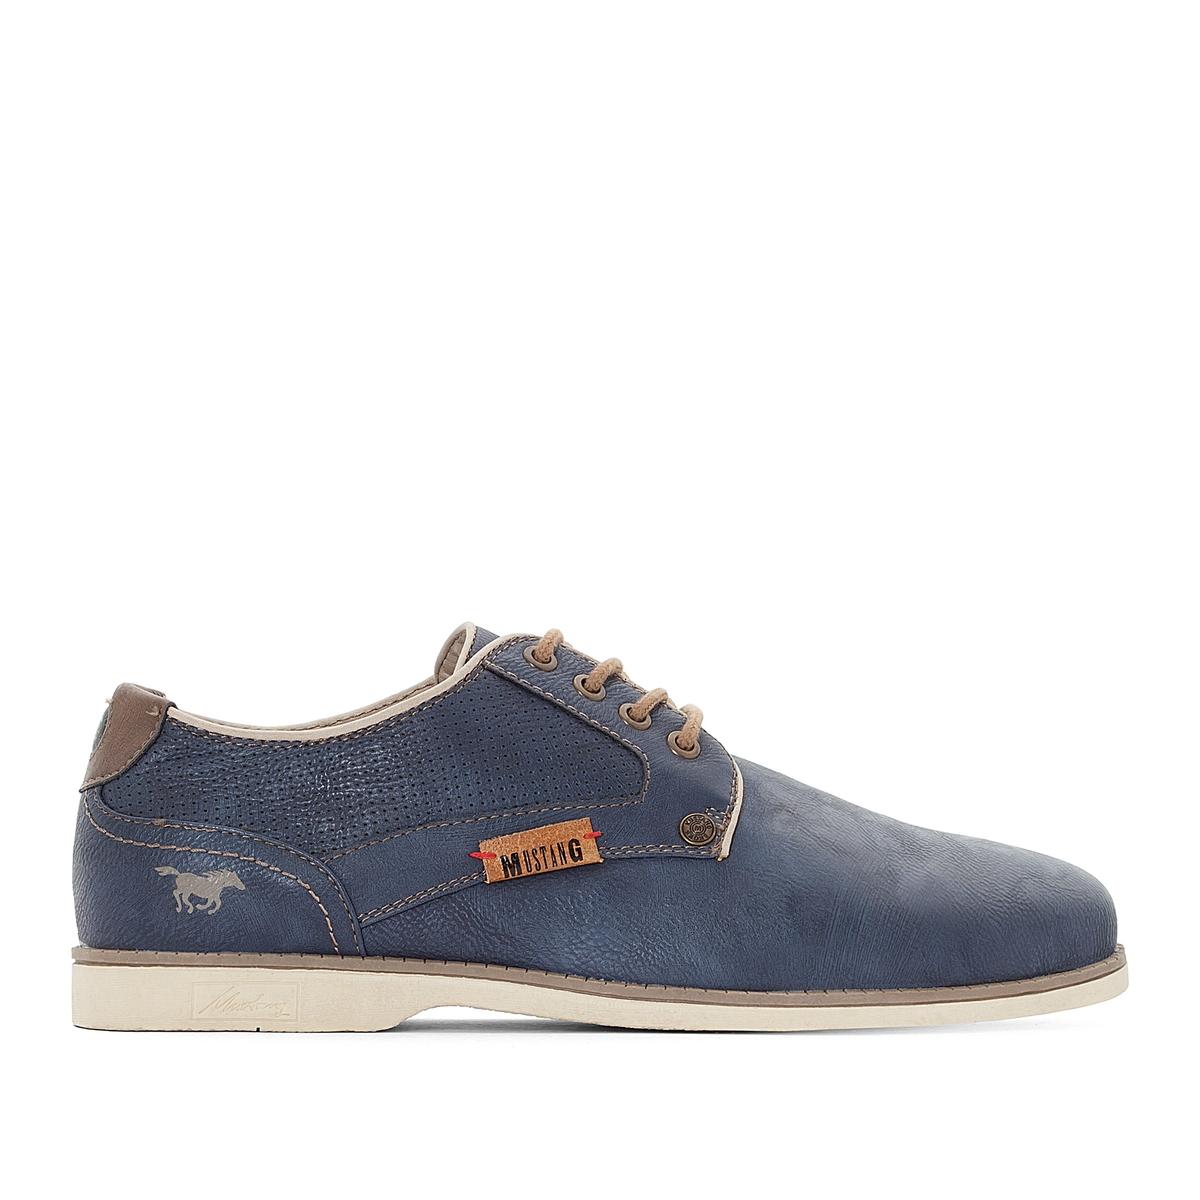 Ботинки-дерби на шнуровке ботинки дерби под кожу питона